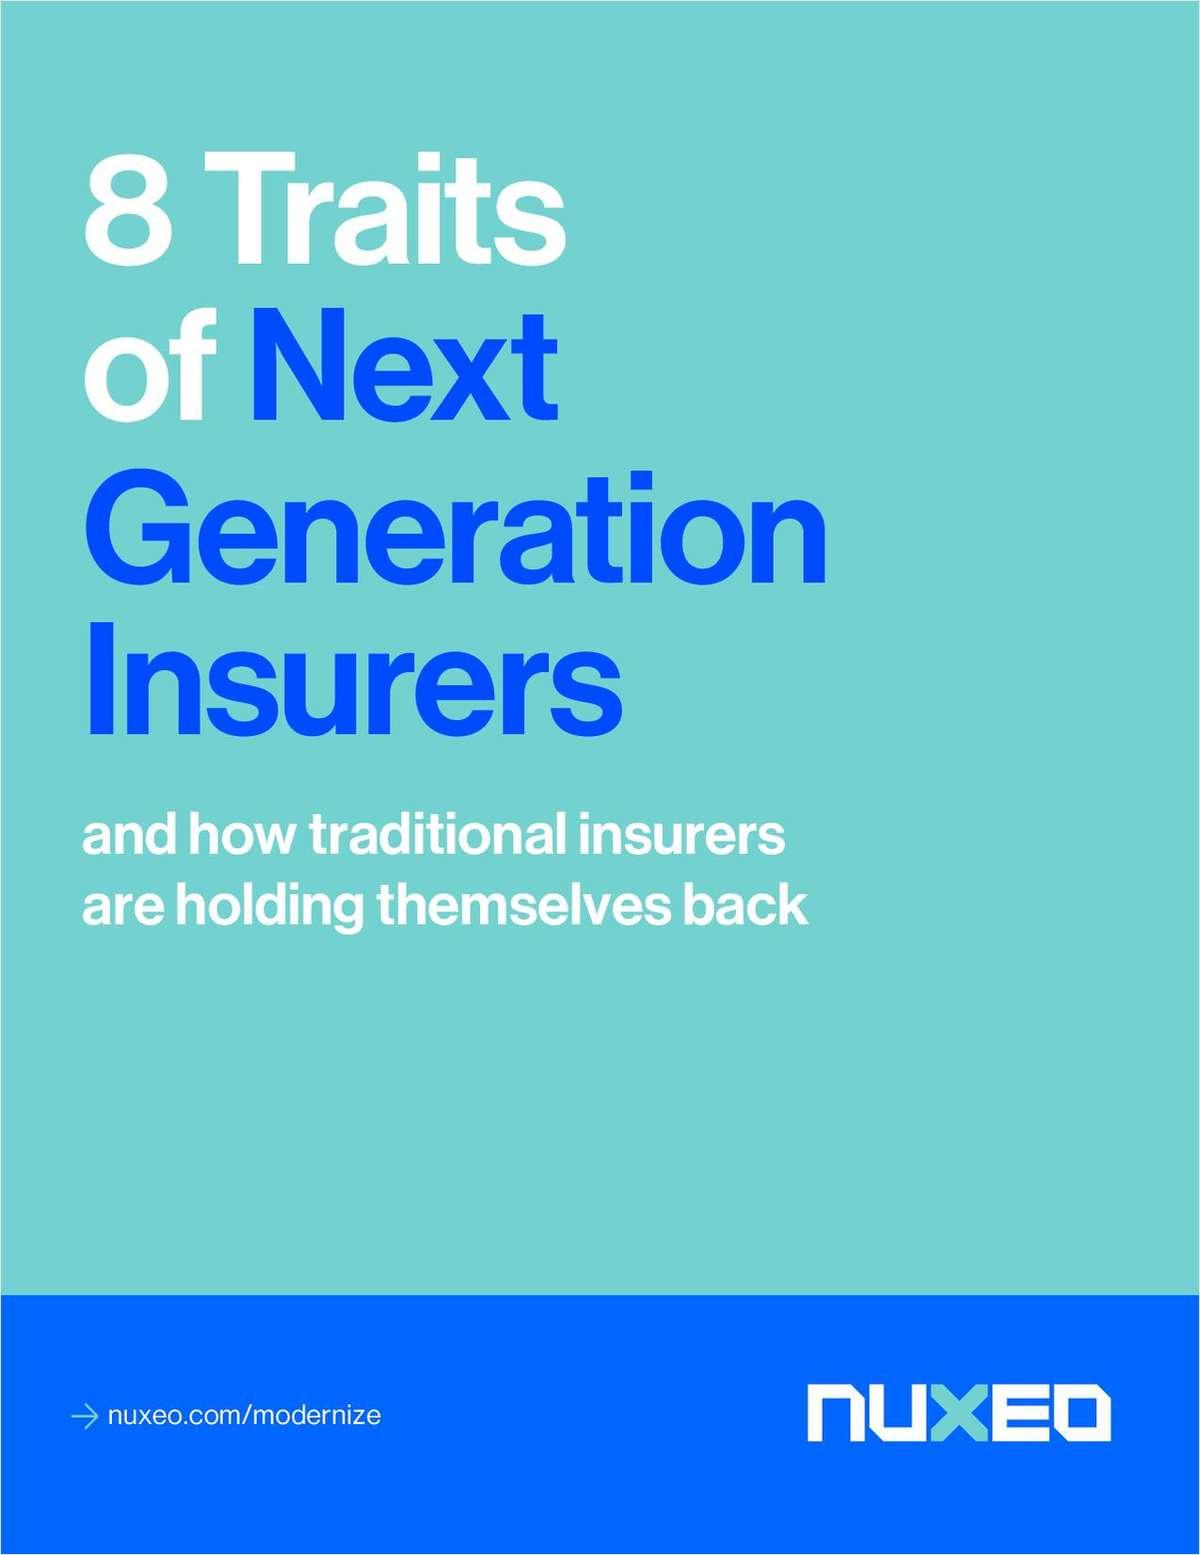 8 Traits of Next Generation Insurers